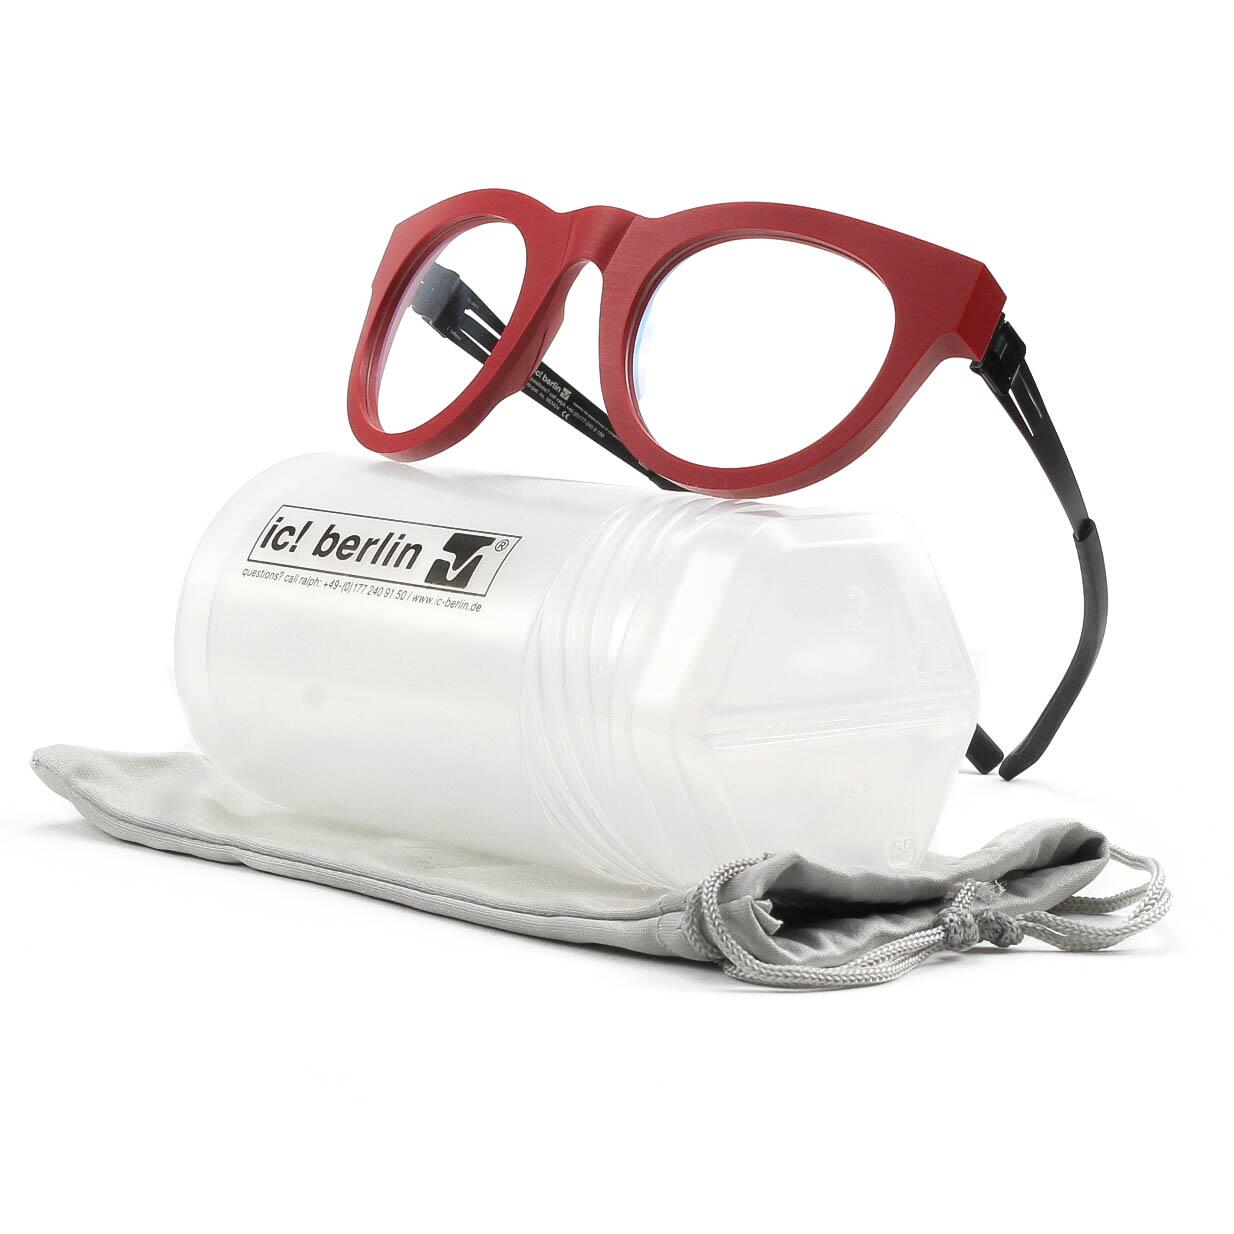 Eyeglasses Frame Temples : ic! berlin A0917 Nameless 17 Eyeglasses Just Red Rough ...